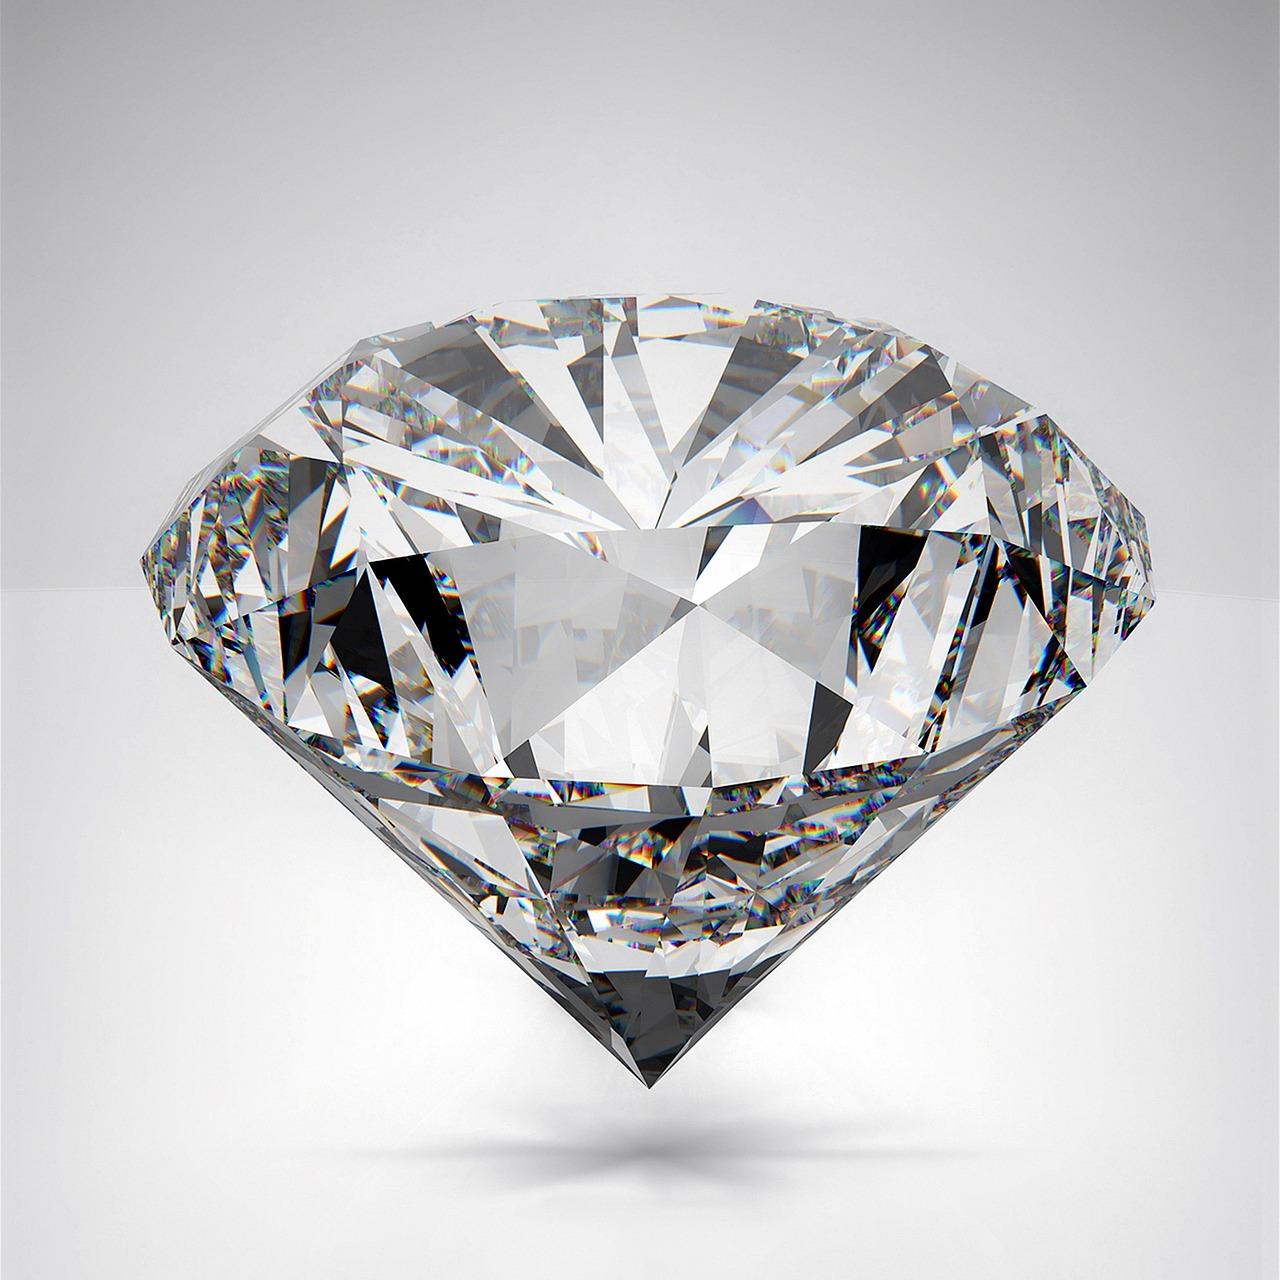 Diamonds are NOT a girl's best friend